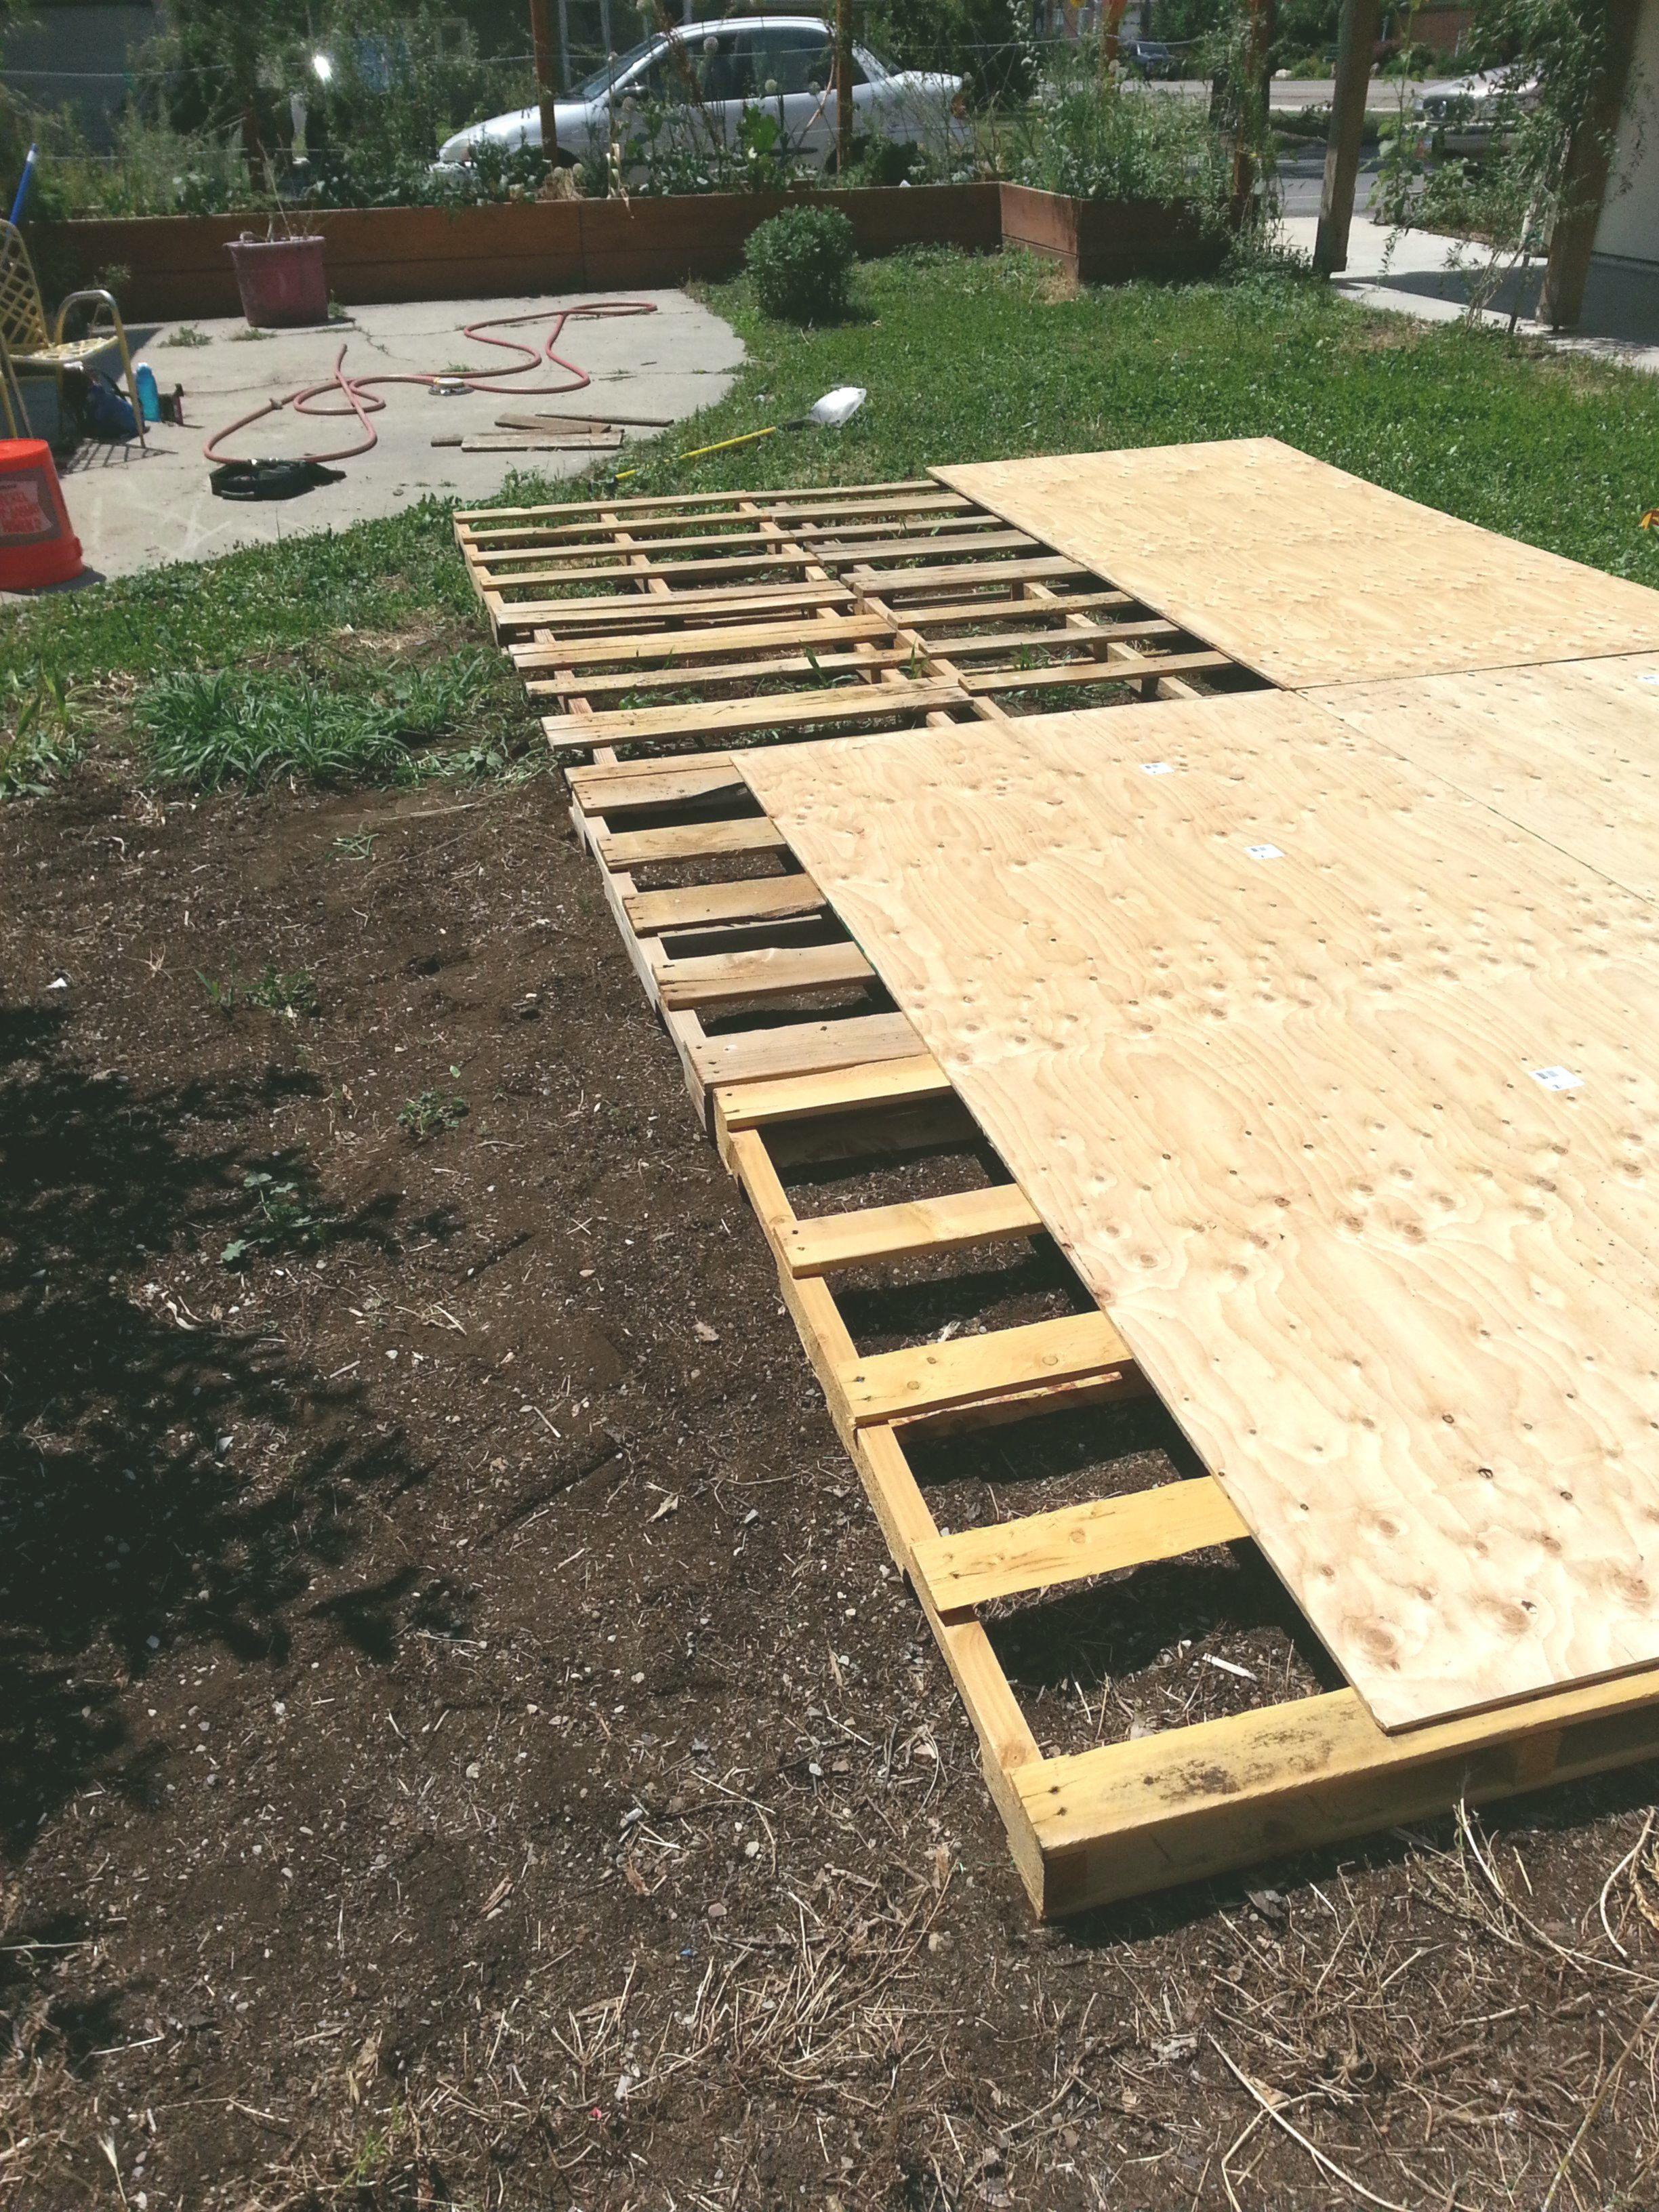 Making A Dance Ground From Recycled Pallets In 2020 Diy Wedding Dance Floor Outdoor Dance Floors Diy Backyard Wedding